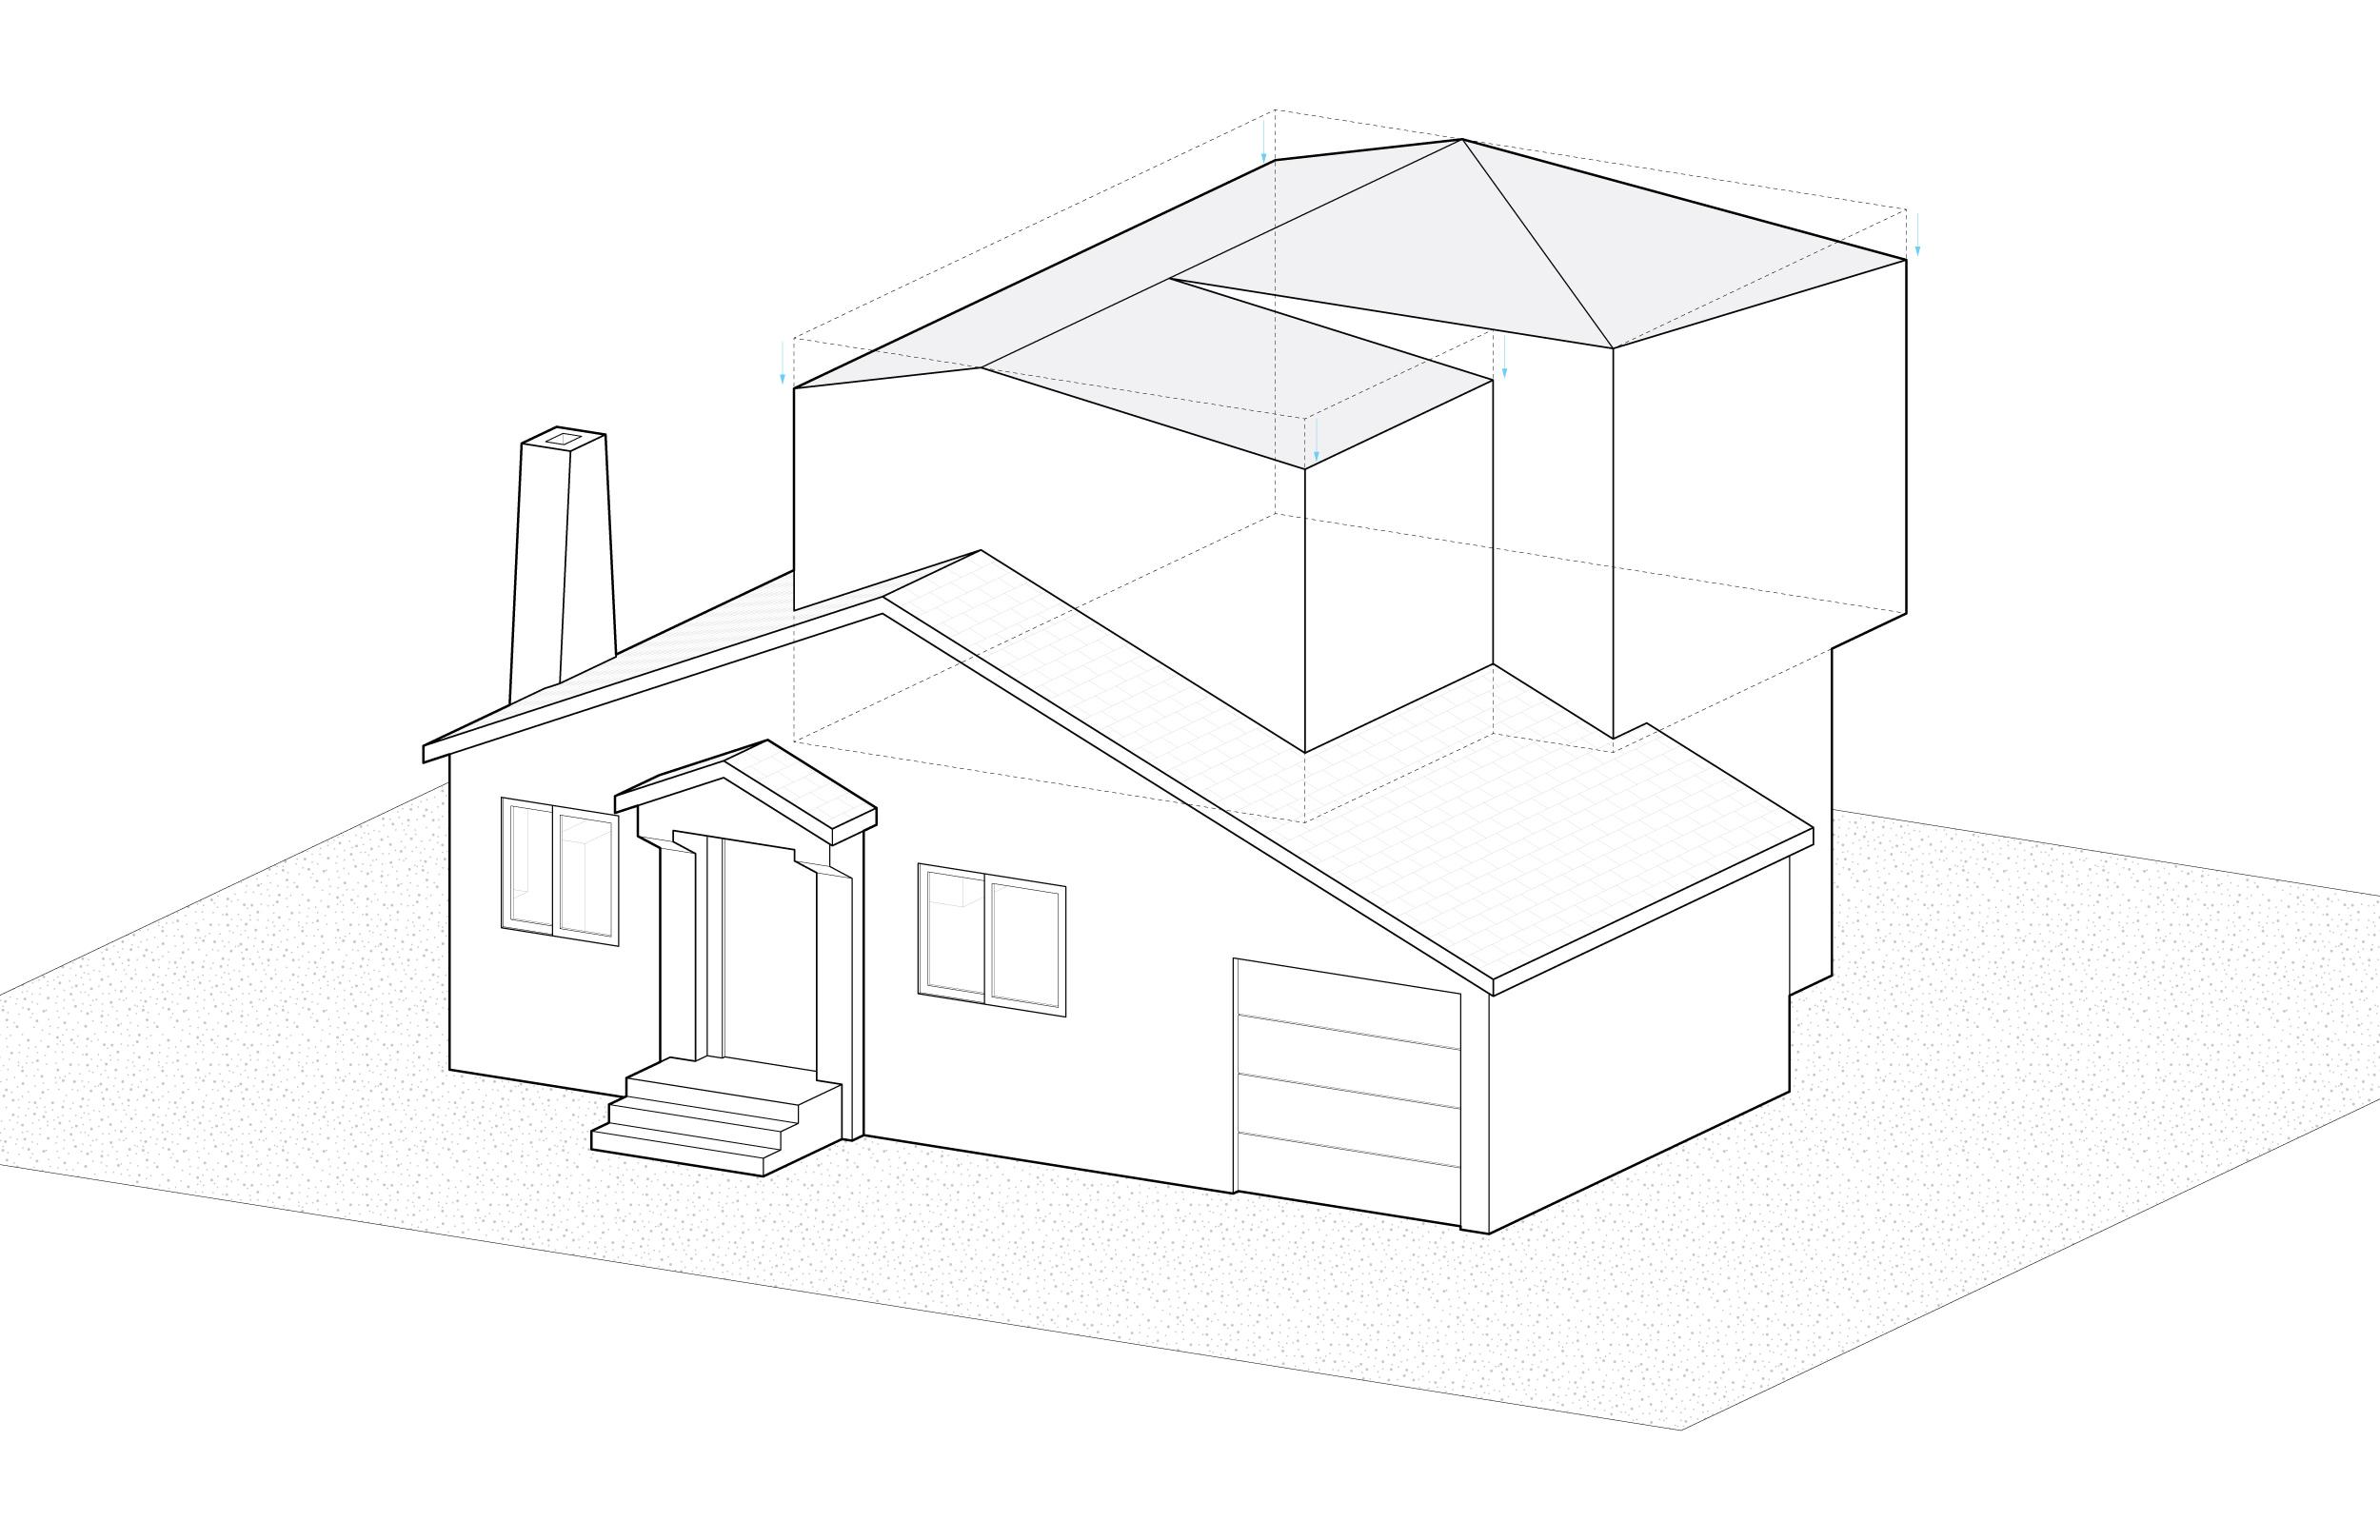 Rosewood-House_Diagram_05.jpg